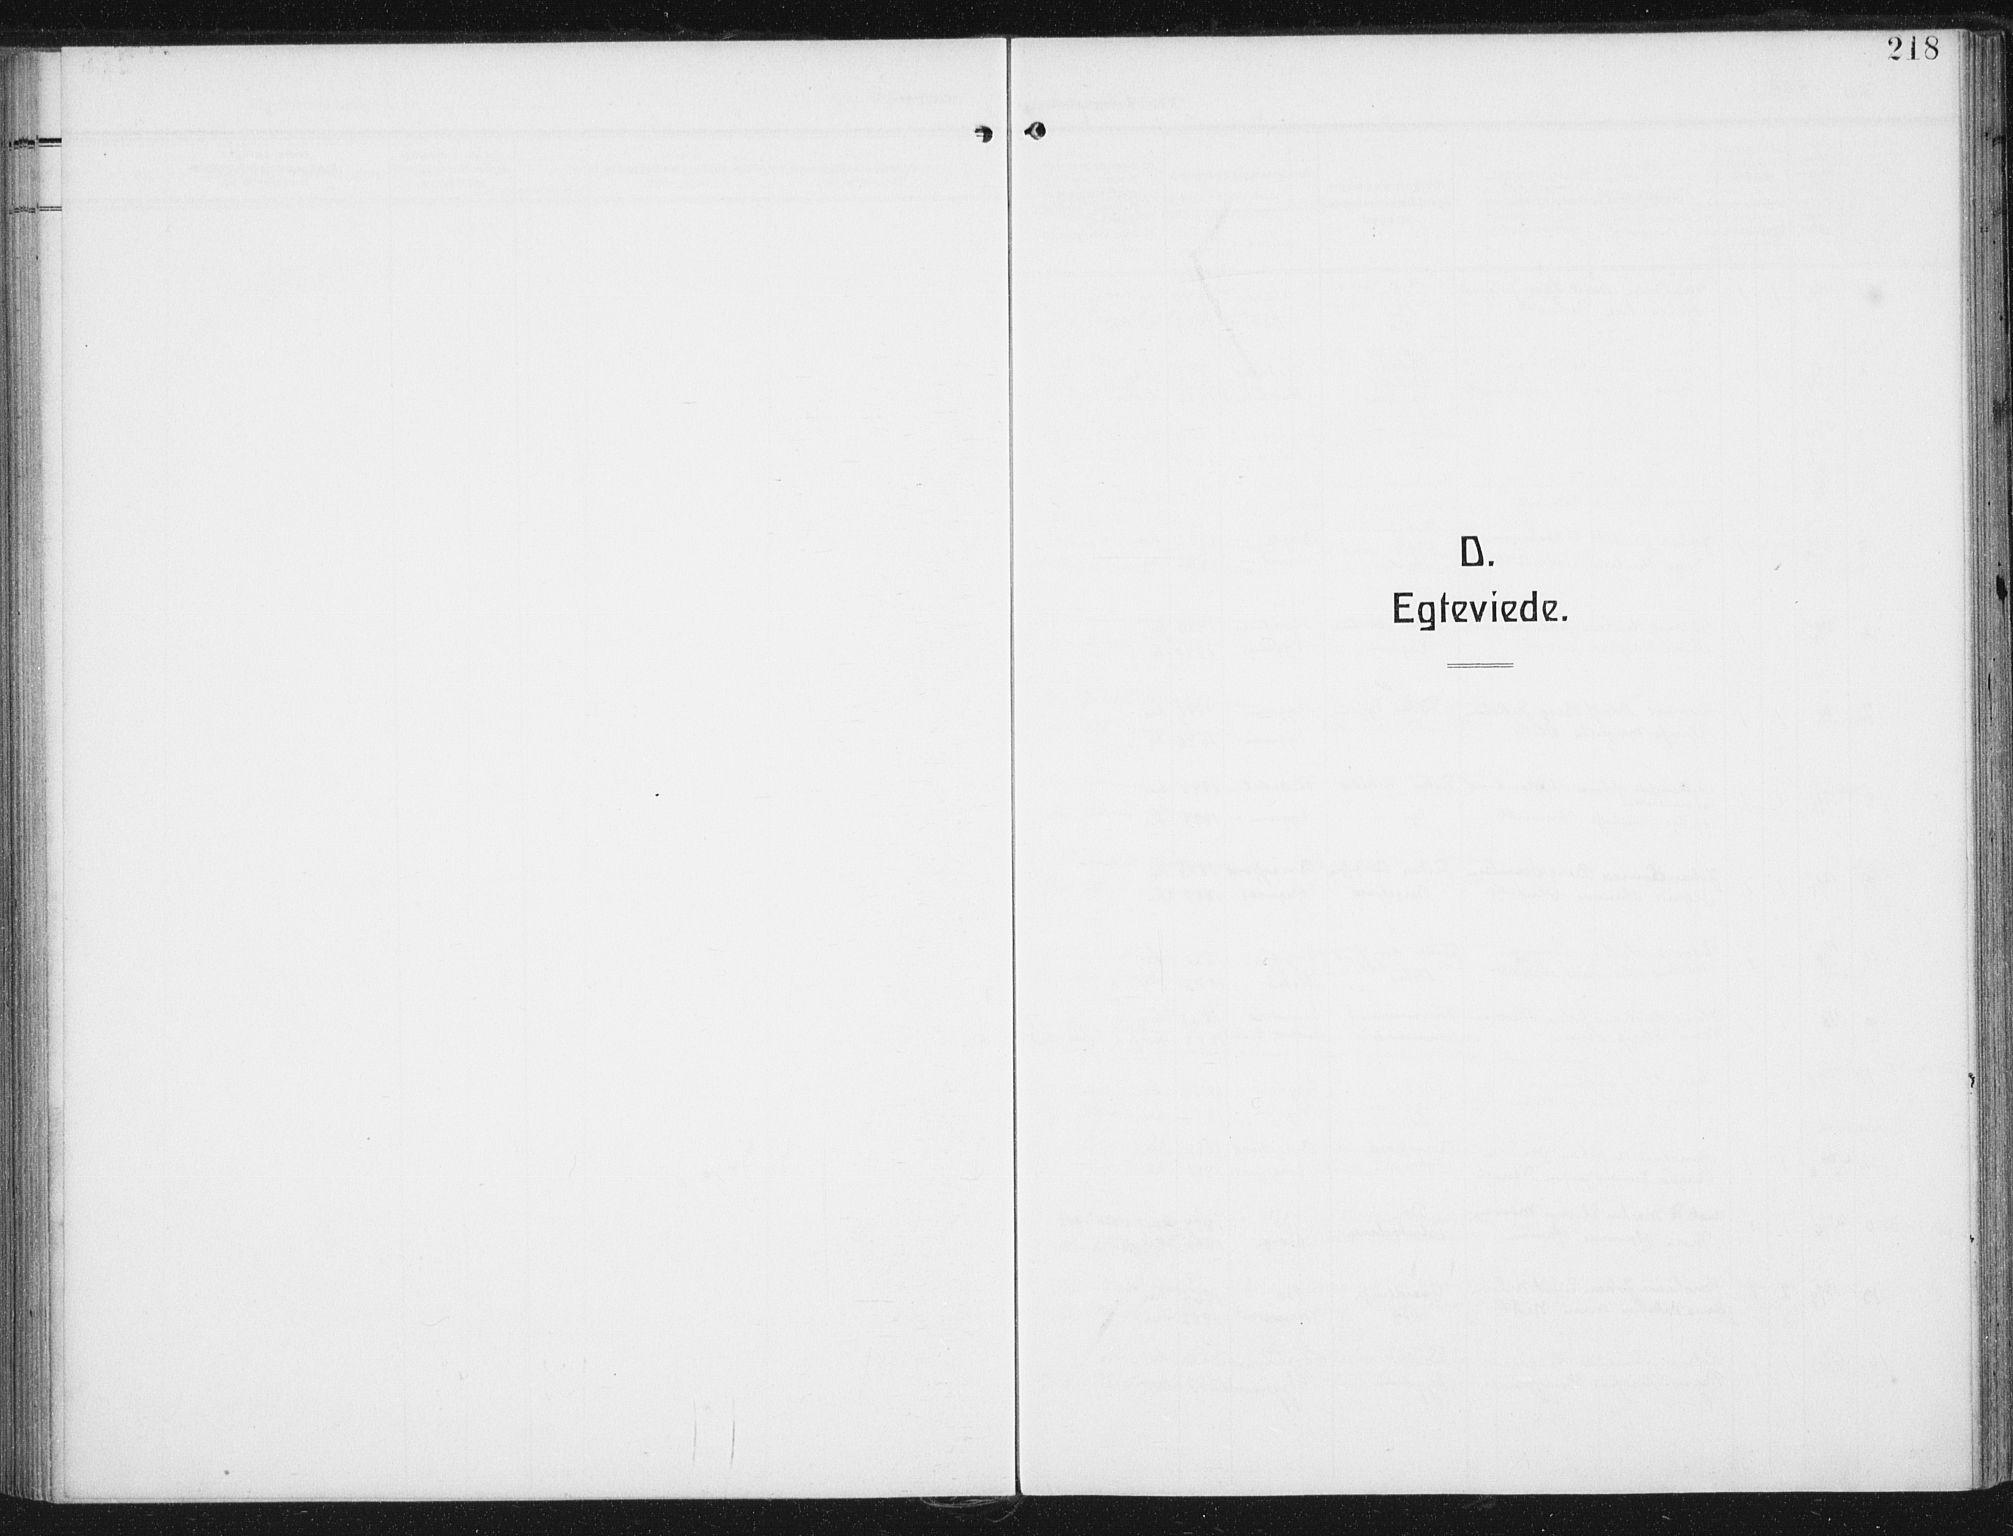 SAT, Ministerialprotokoller, klokkerbøker og fødselsregistre - Nordland, 880/L1135: Ministerialbok nr. 880A09, 1908-1919, s. 218